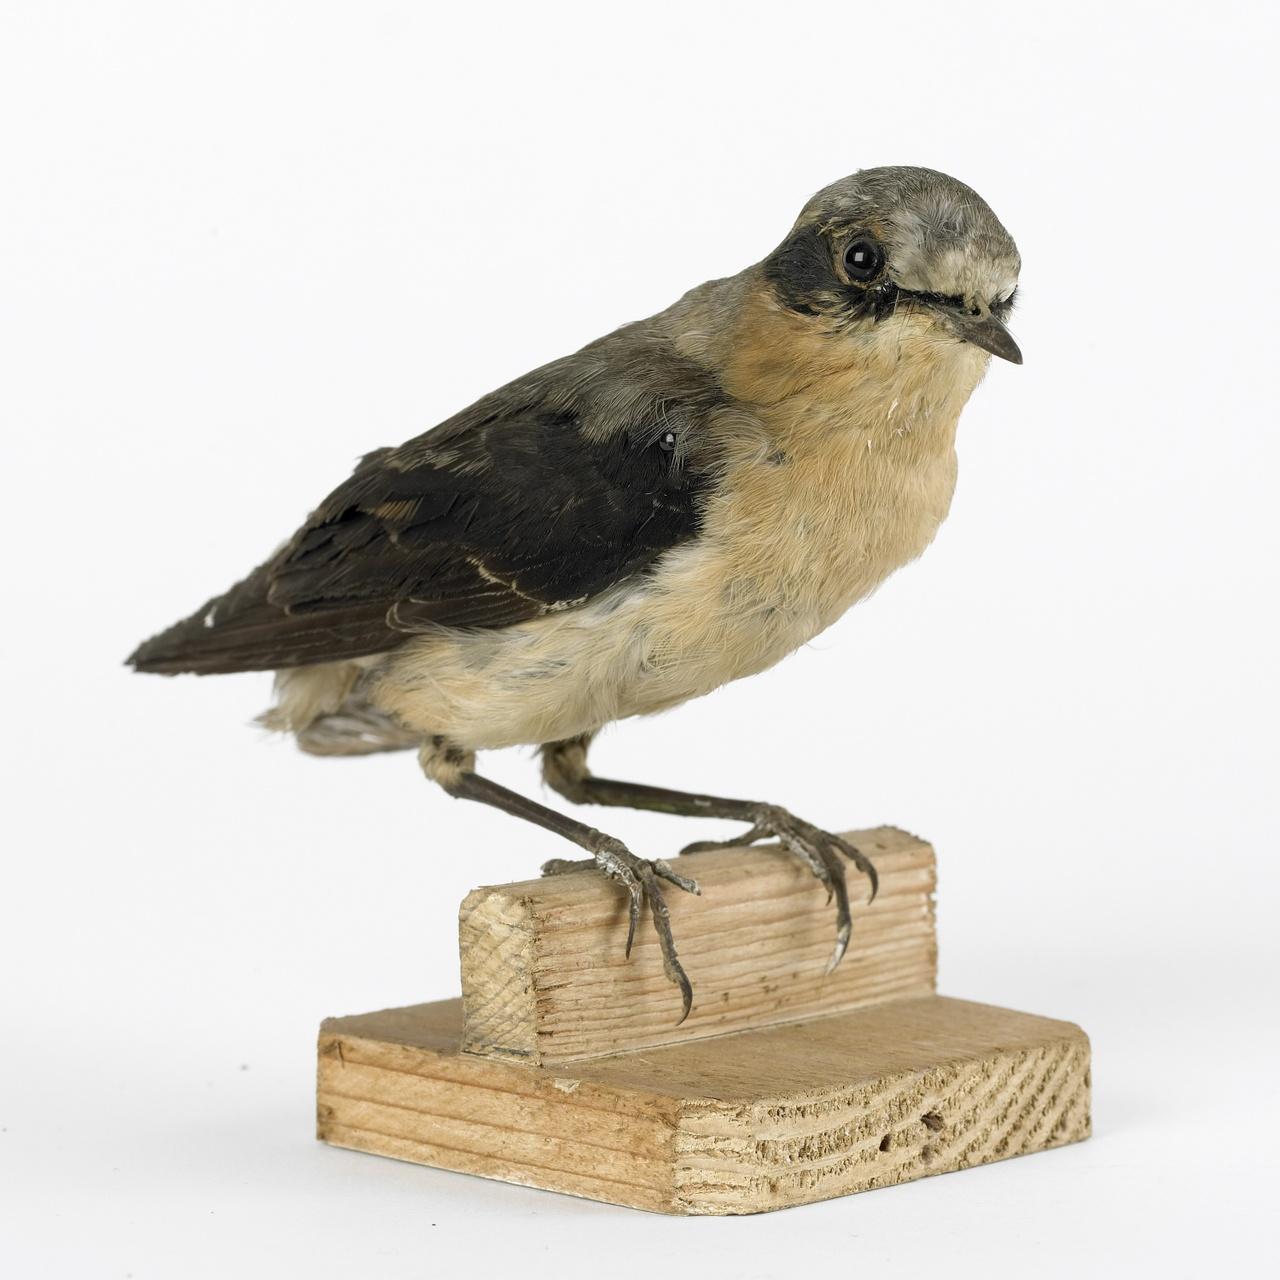 Oenanthe oenanthe (Linnaeus, 1758), Tapuit, opgezette vogel